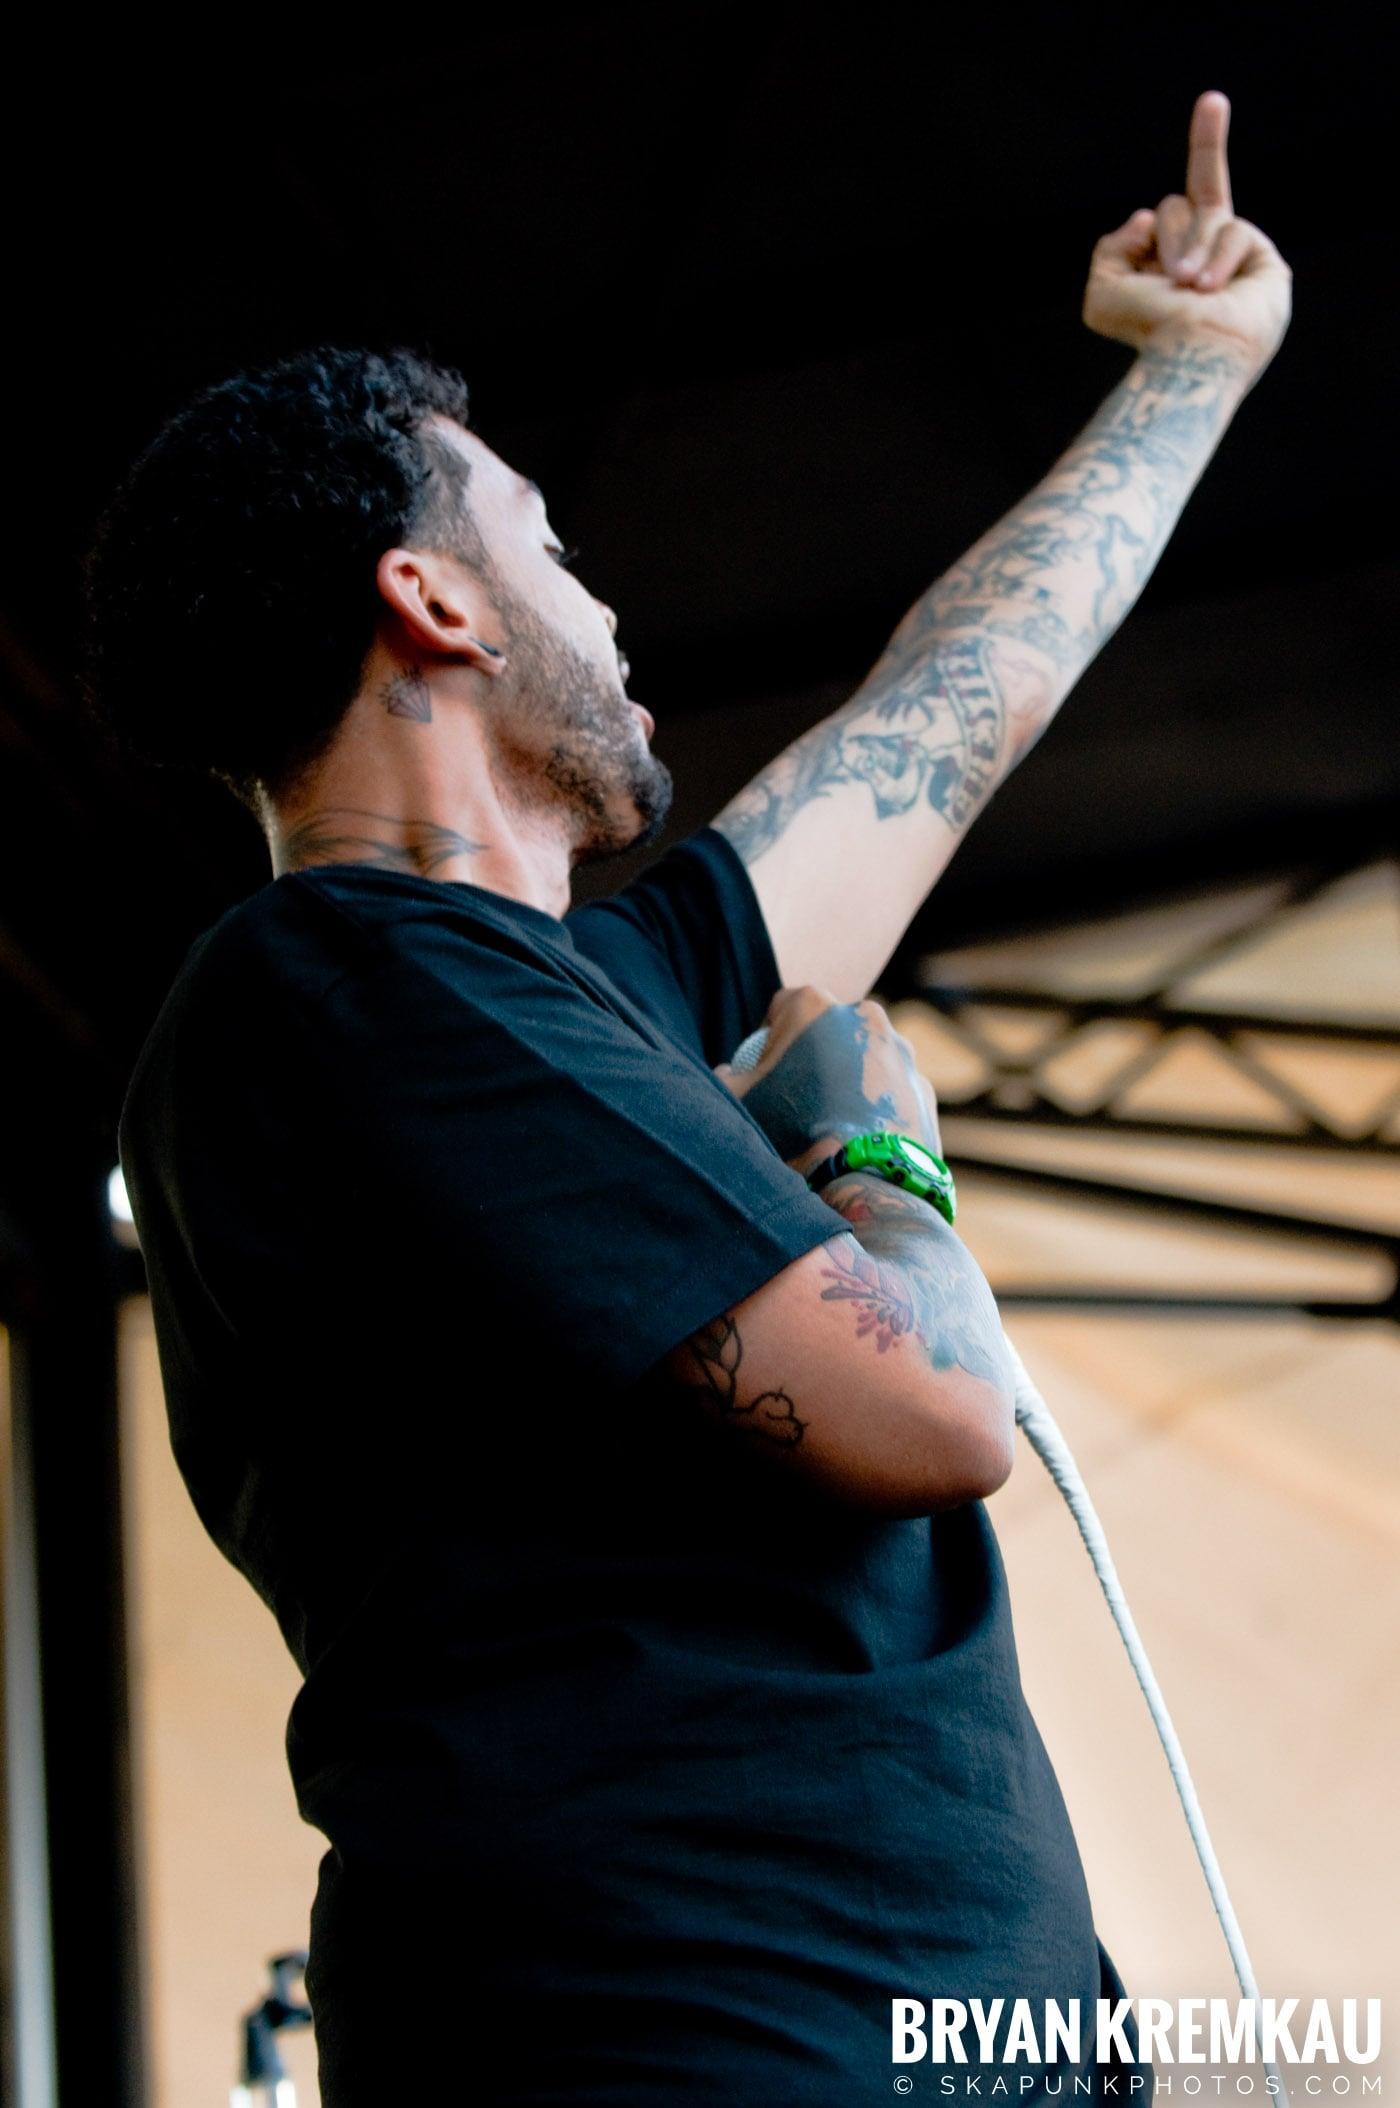 Gym Class Heroes @ Warped Tour 08, Scranton PA - 7.27.08 (4)